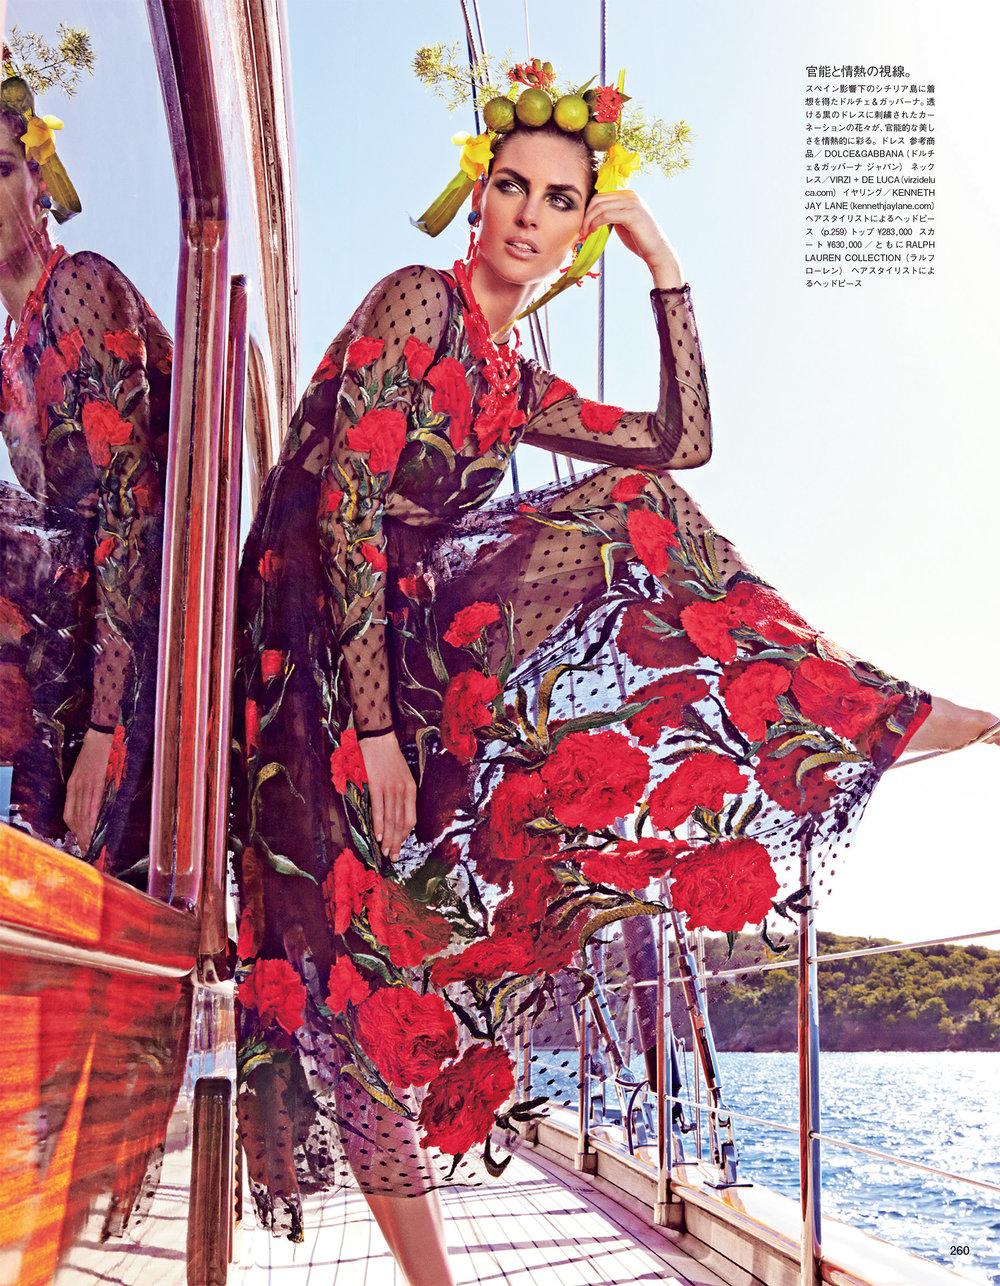 Giovanna-Battaglia-Vogue-Japan-Mariano-Vivanco-Forbidden-Paradise-2.jpg